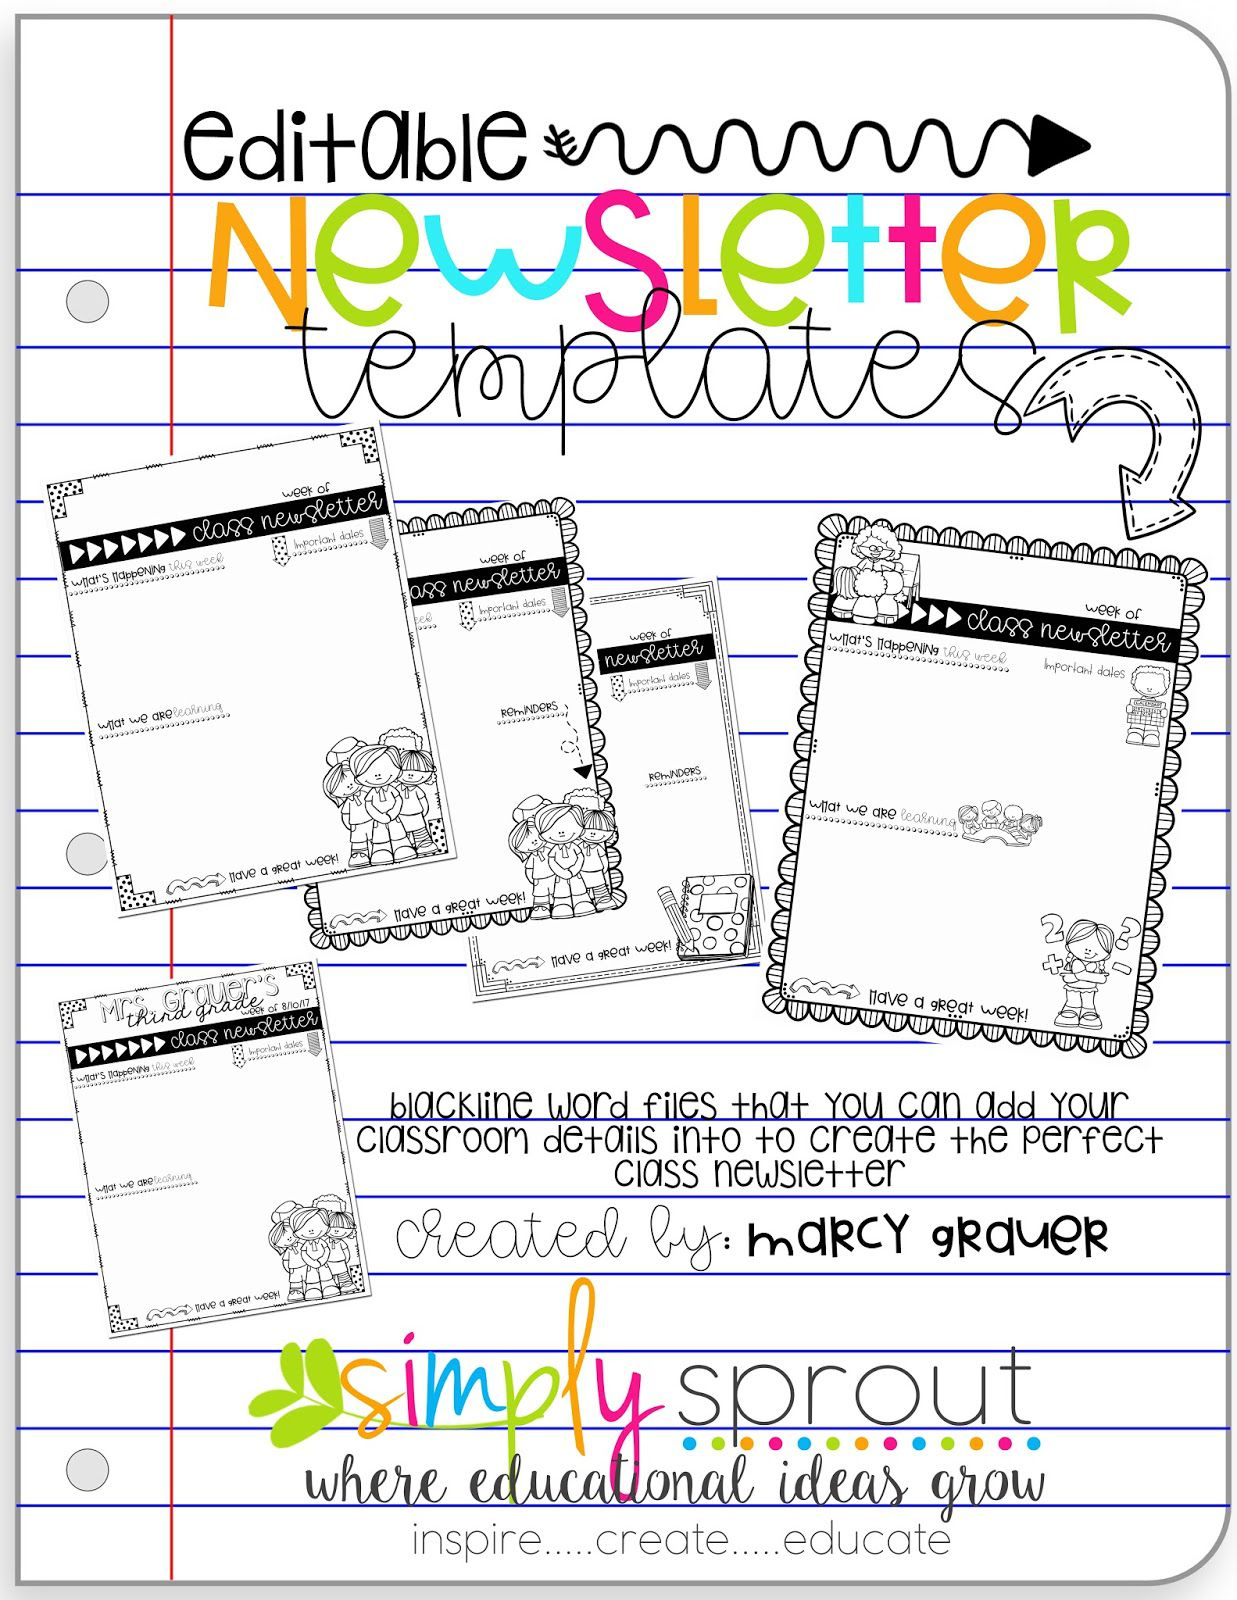 009 Surprising School Newsletter Template Word Design  Free Classroom For MicrosoftFull